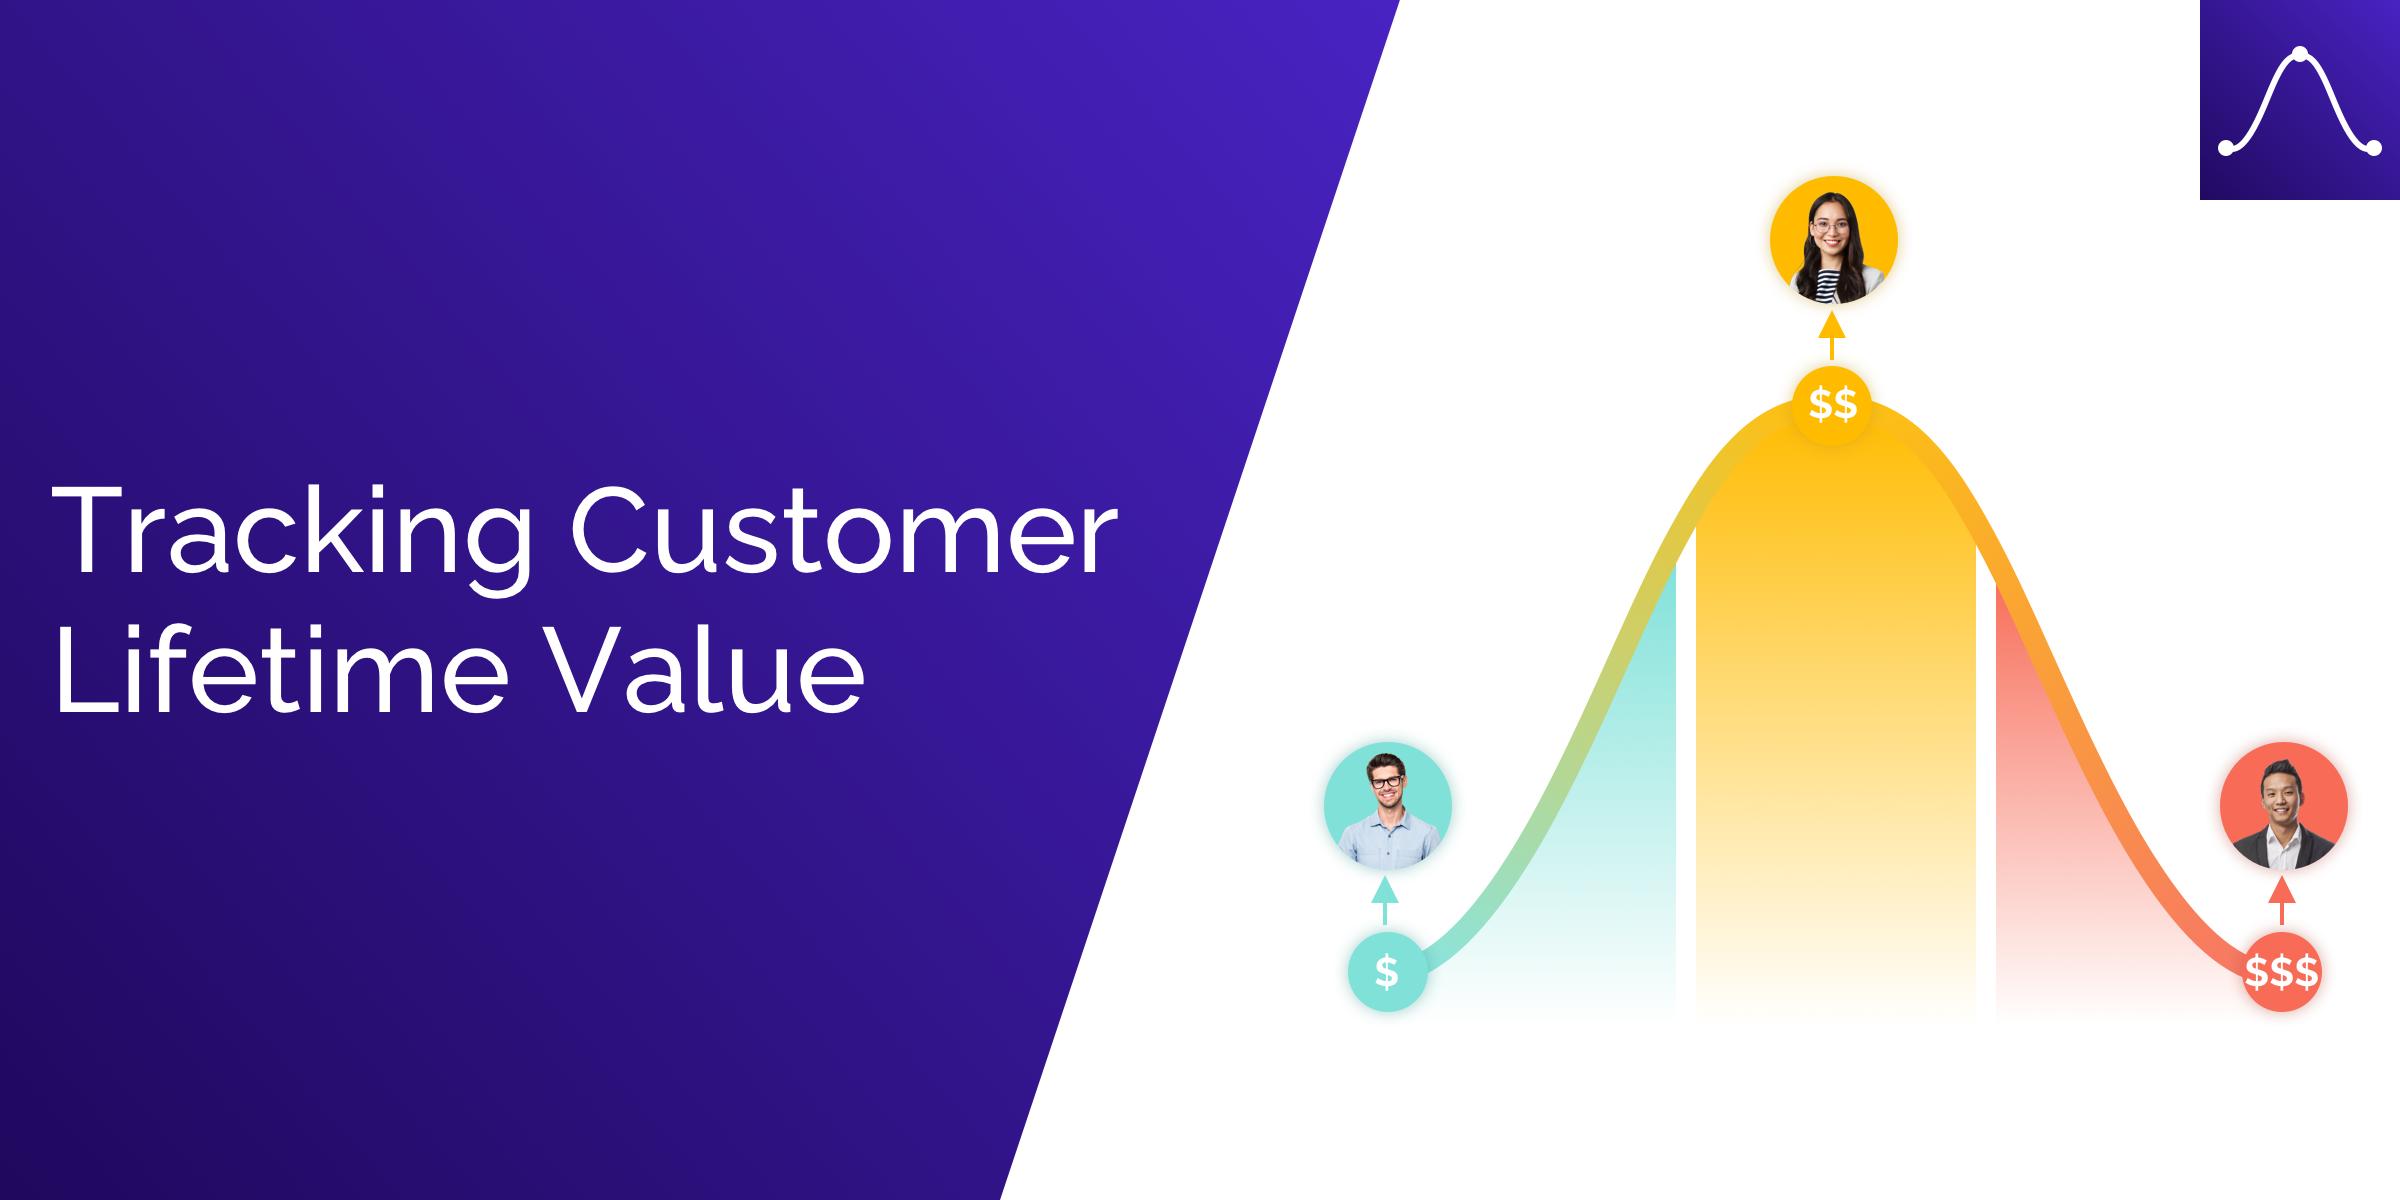 Tracking Customer Lifetime Value